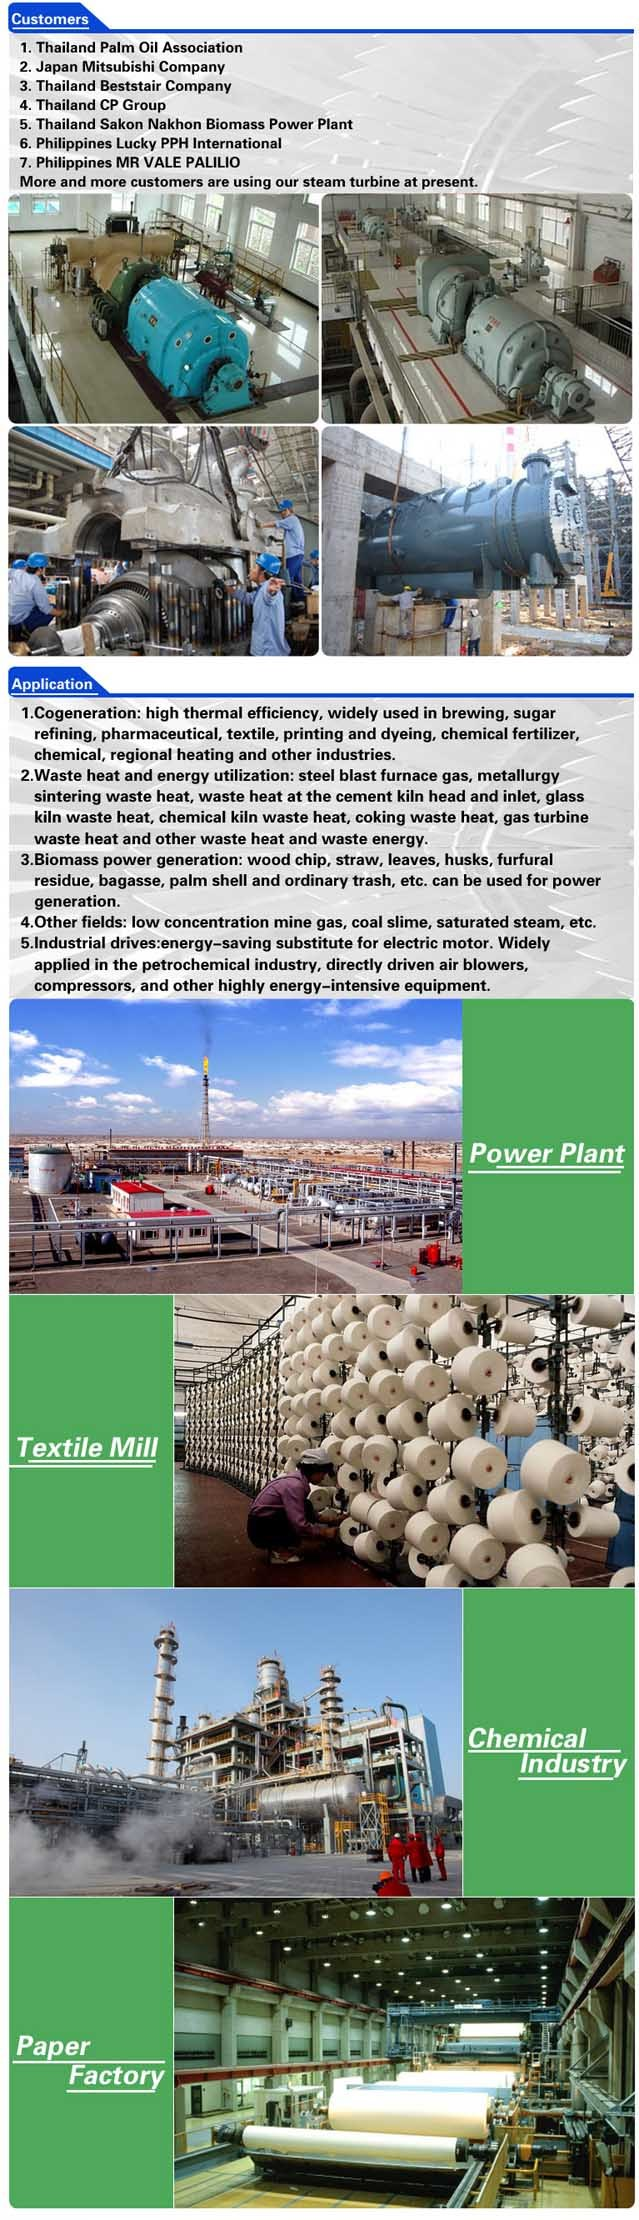 boiler turbine generator btg equipment market Global boiler turbine and generator (btg) market professional survey report 2017 , industry report.